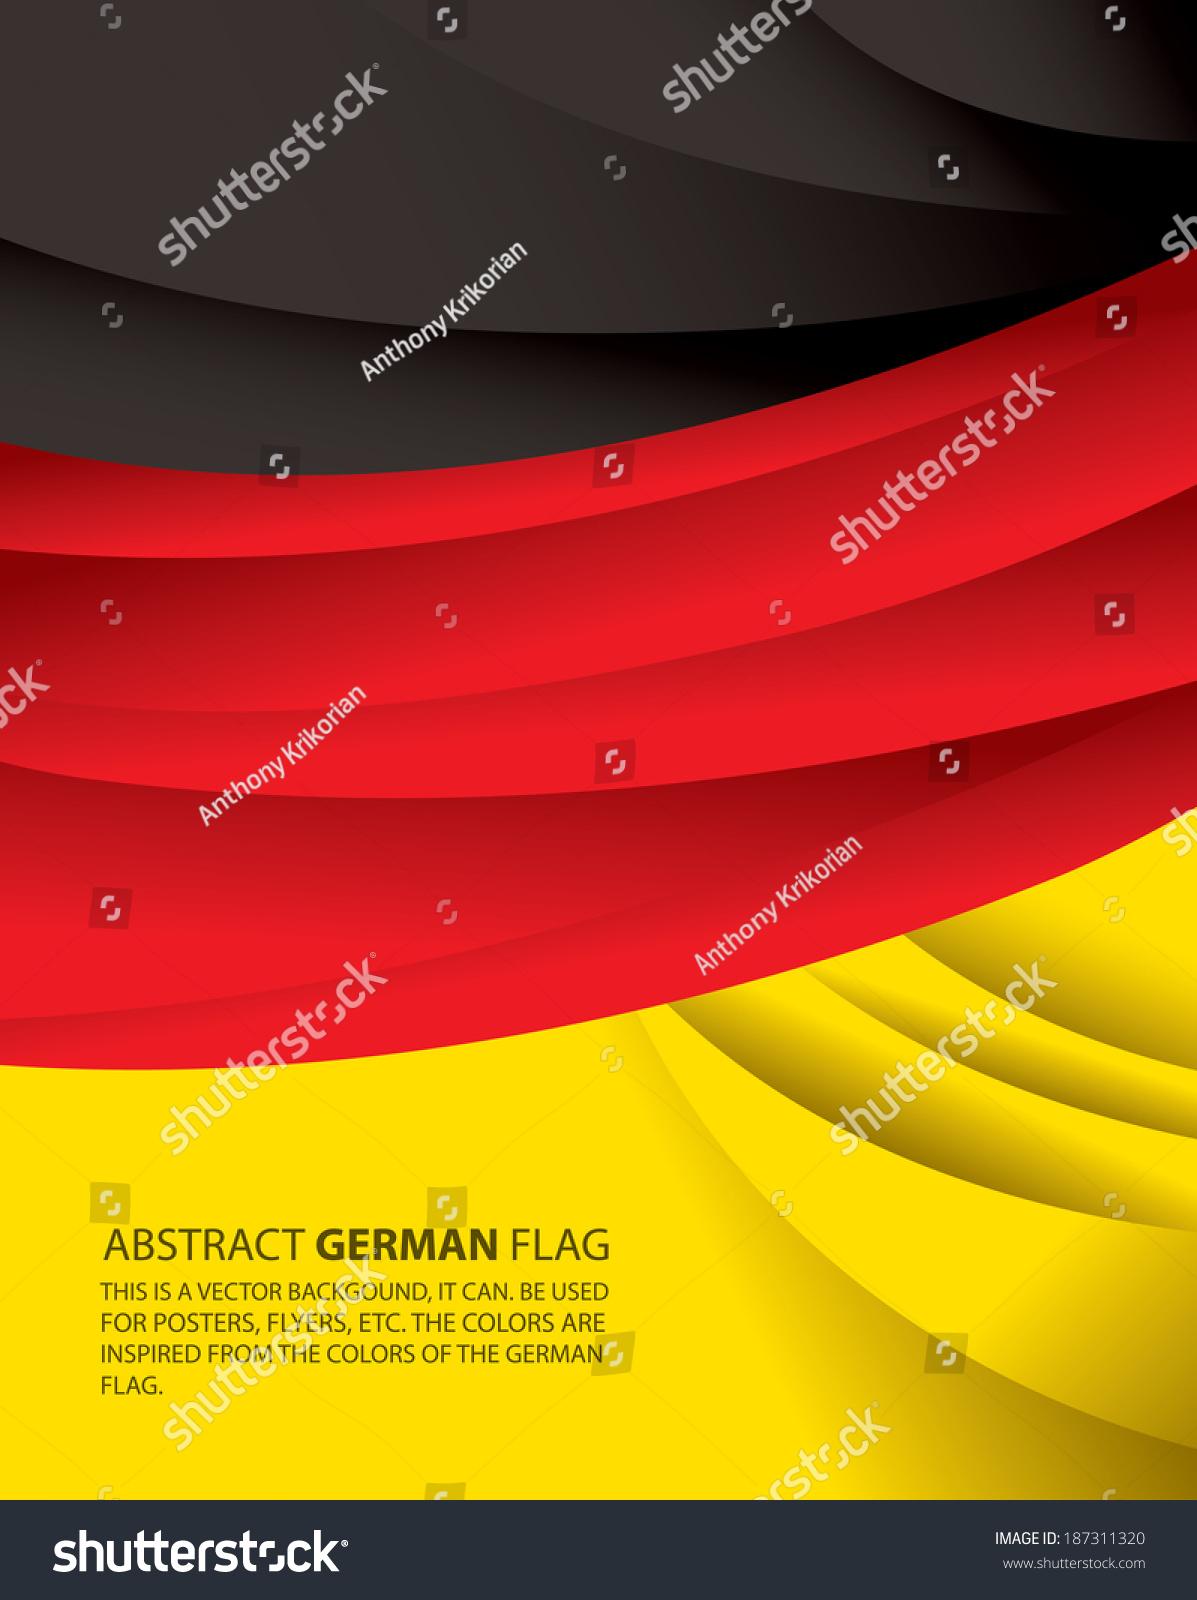 abstract germany german flag vector art stock vector 187311320